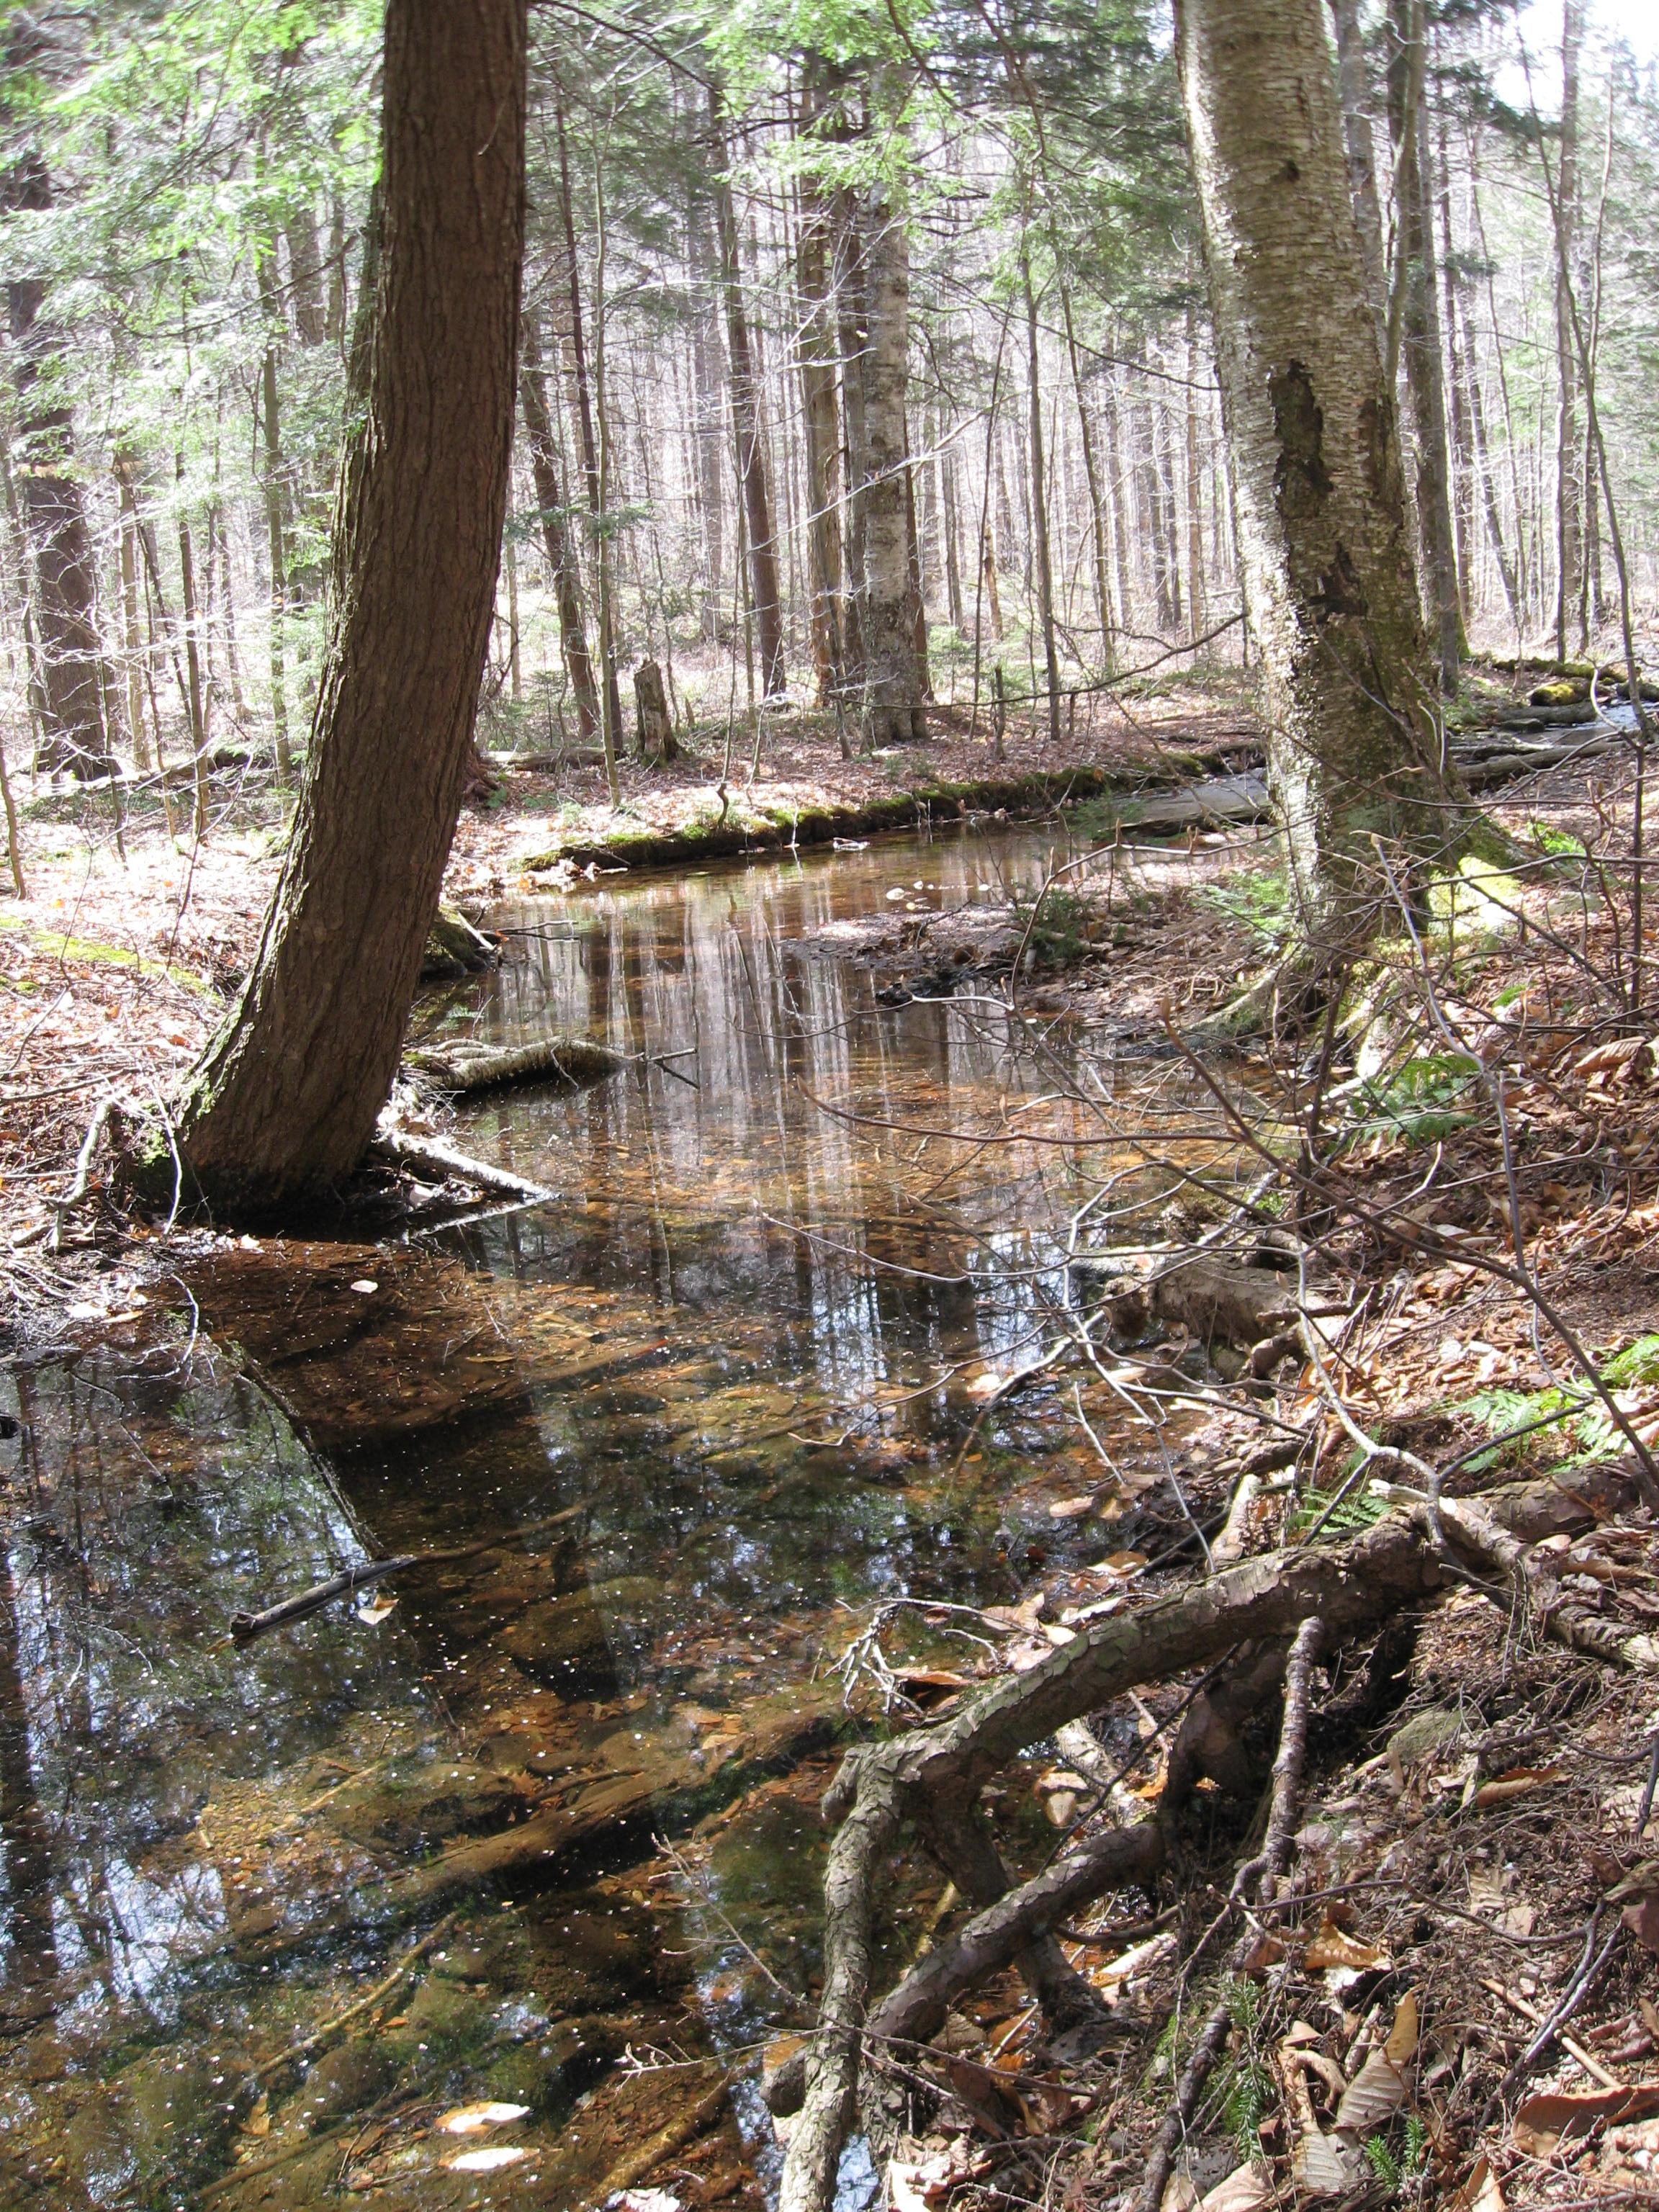 Adirondack Park creek, near Jockeybush and Good Luck Lake